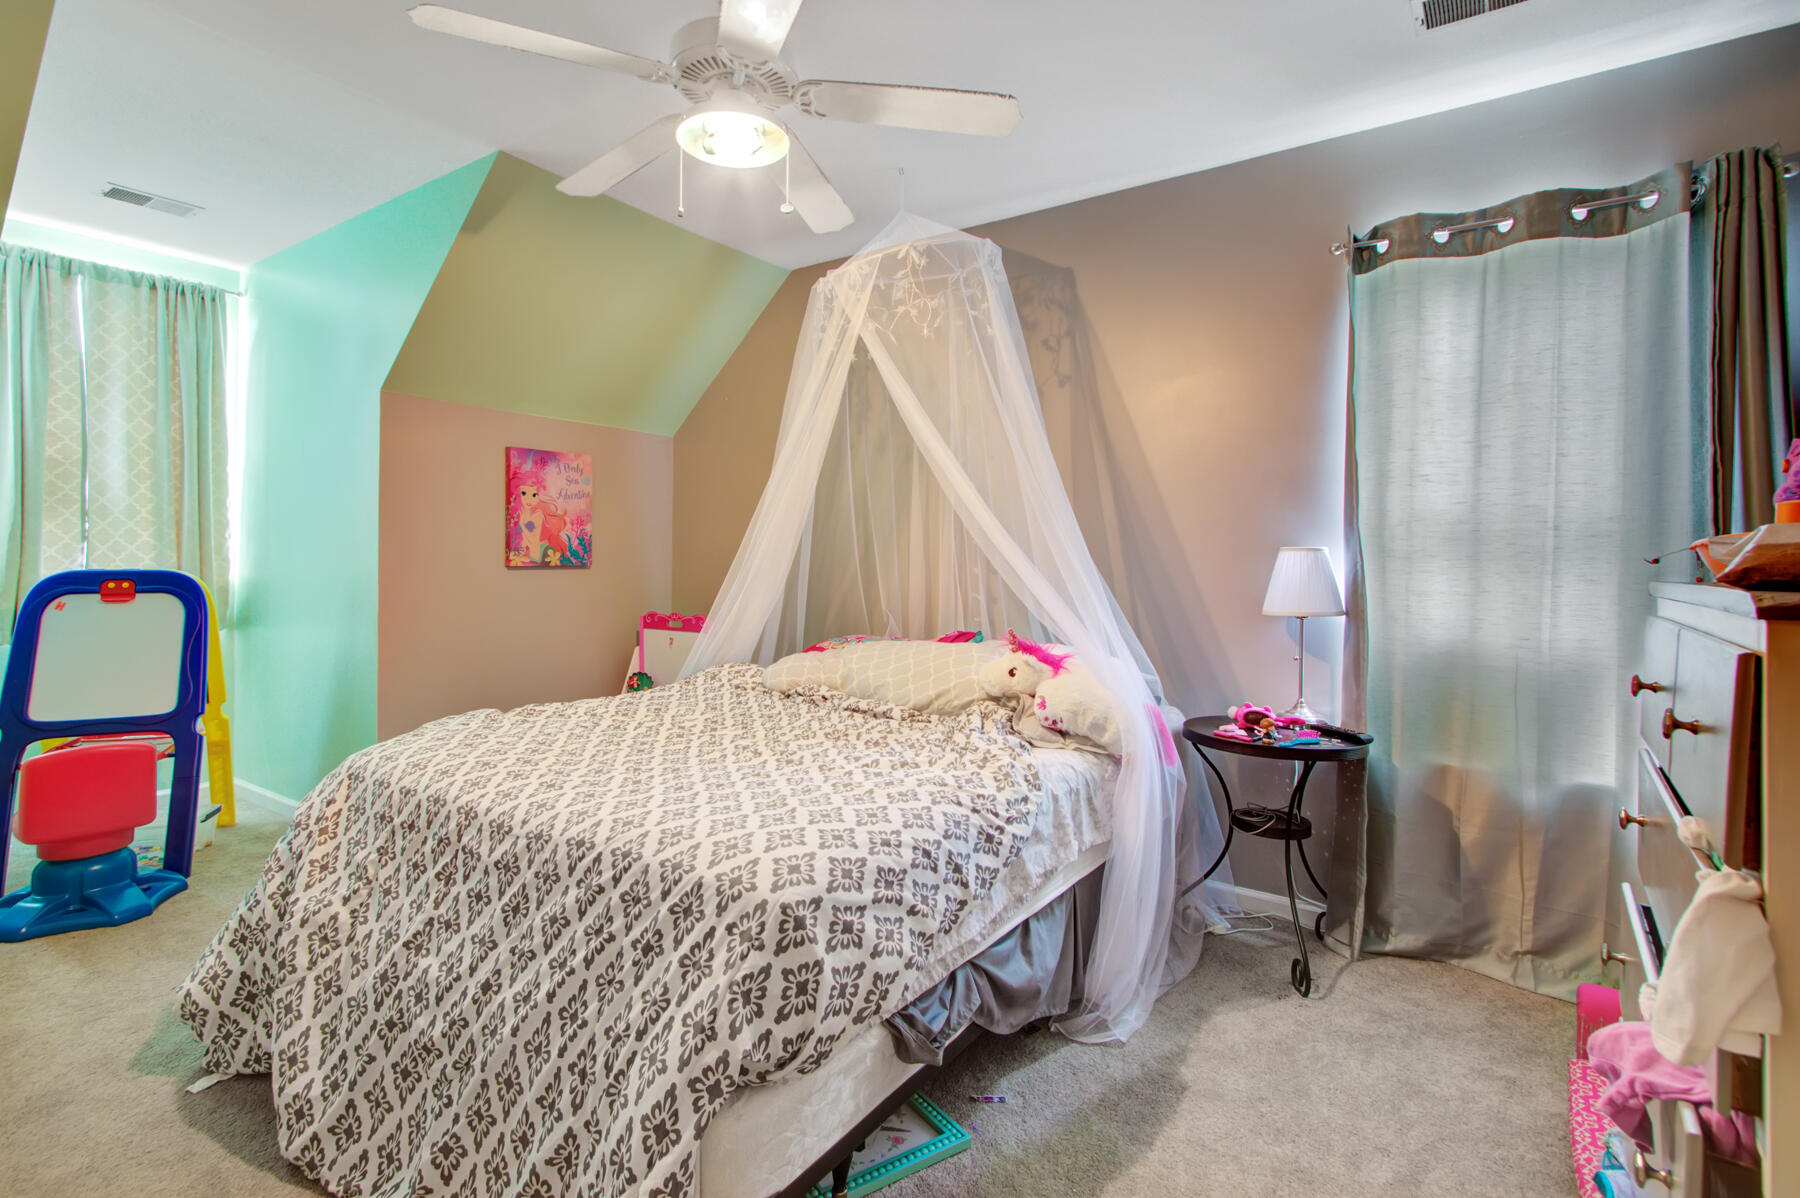 Dunes West Homes For Sale - 2232 Kings Gate, Mount Pleasant, SC - 17